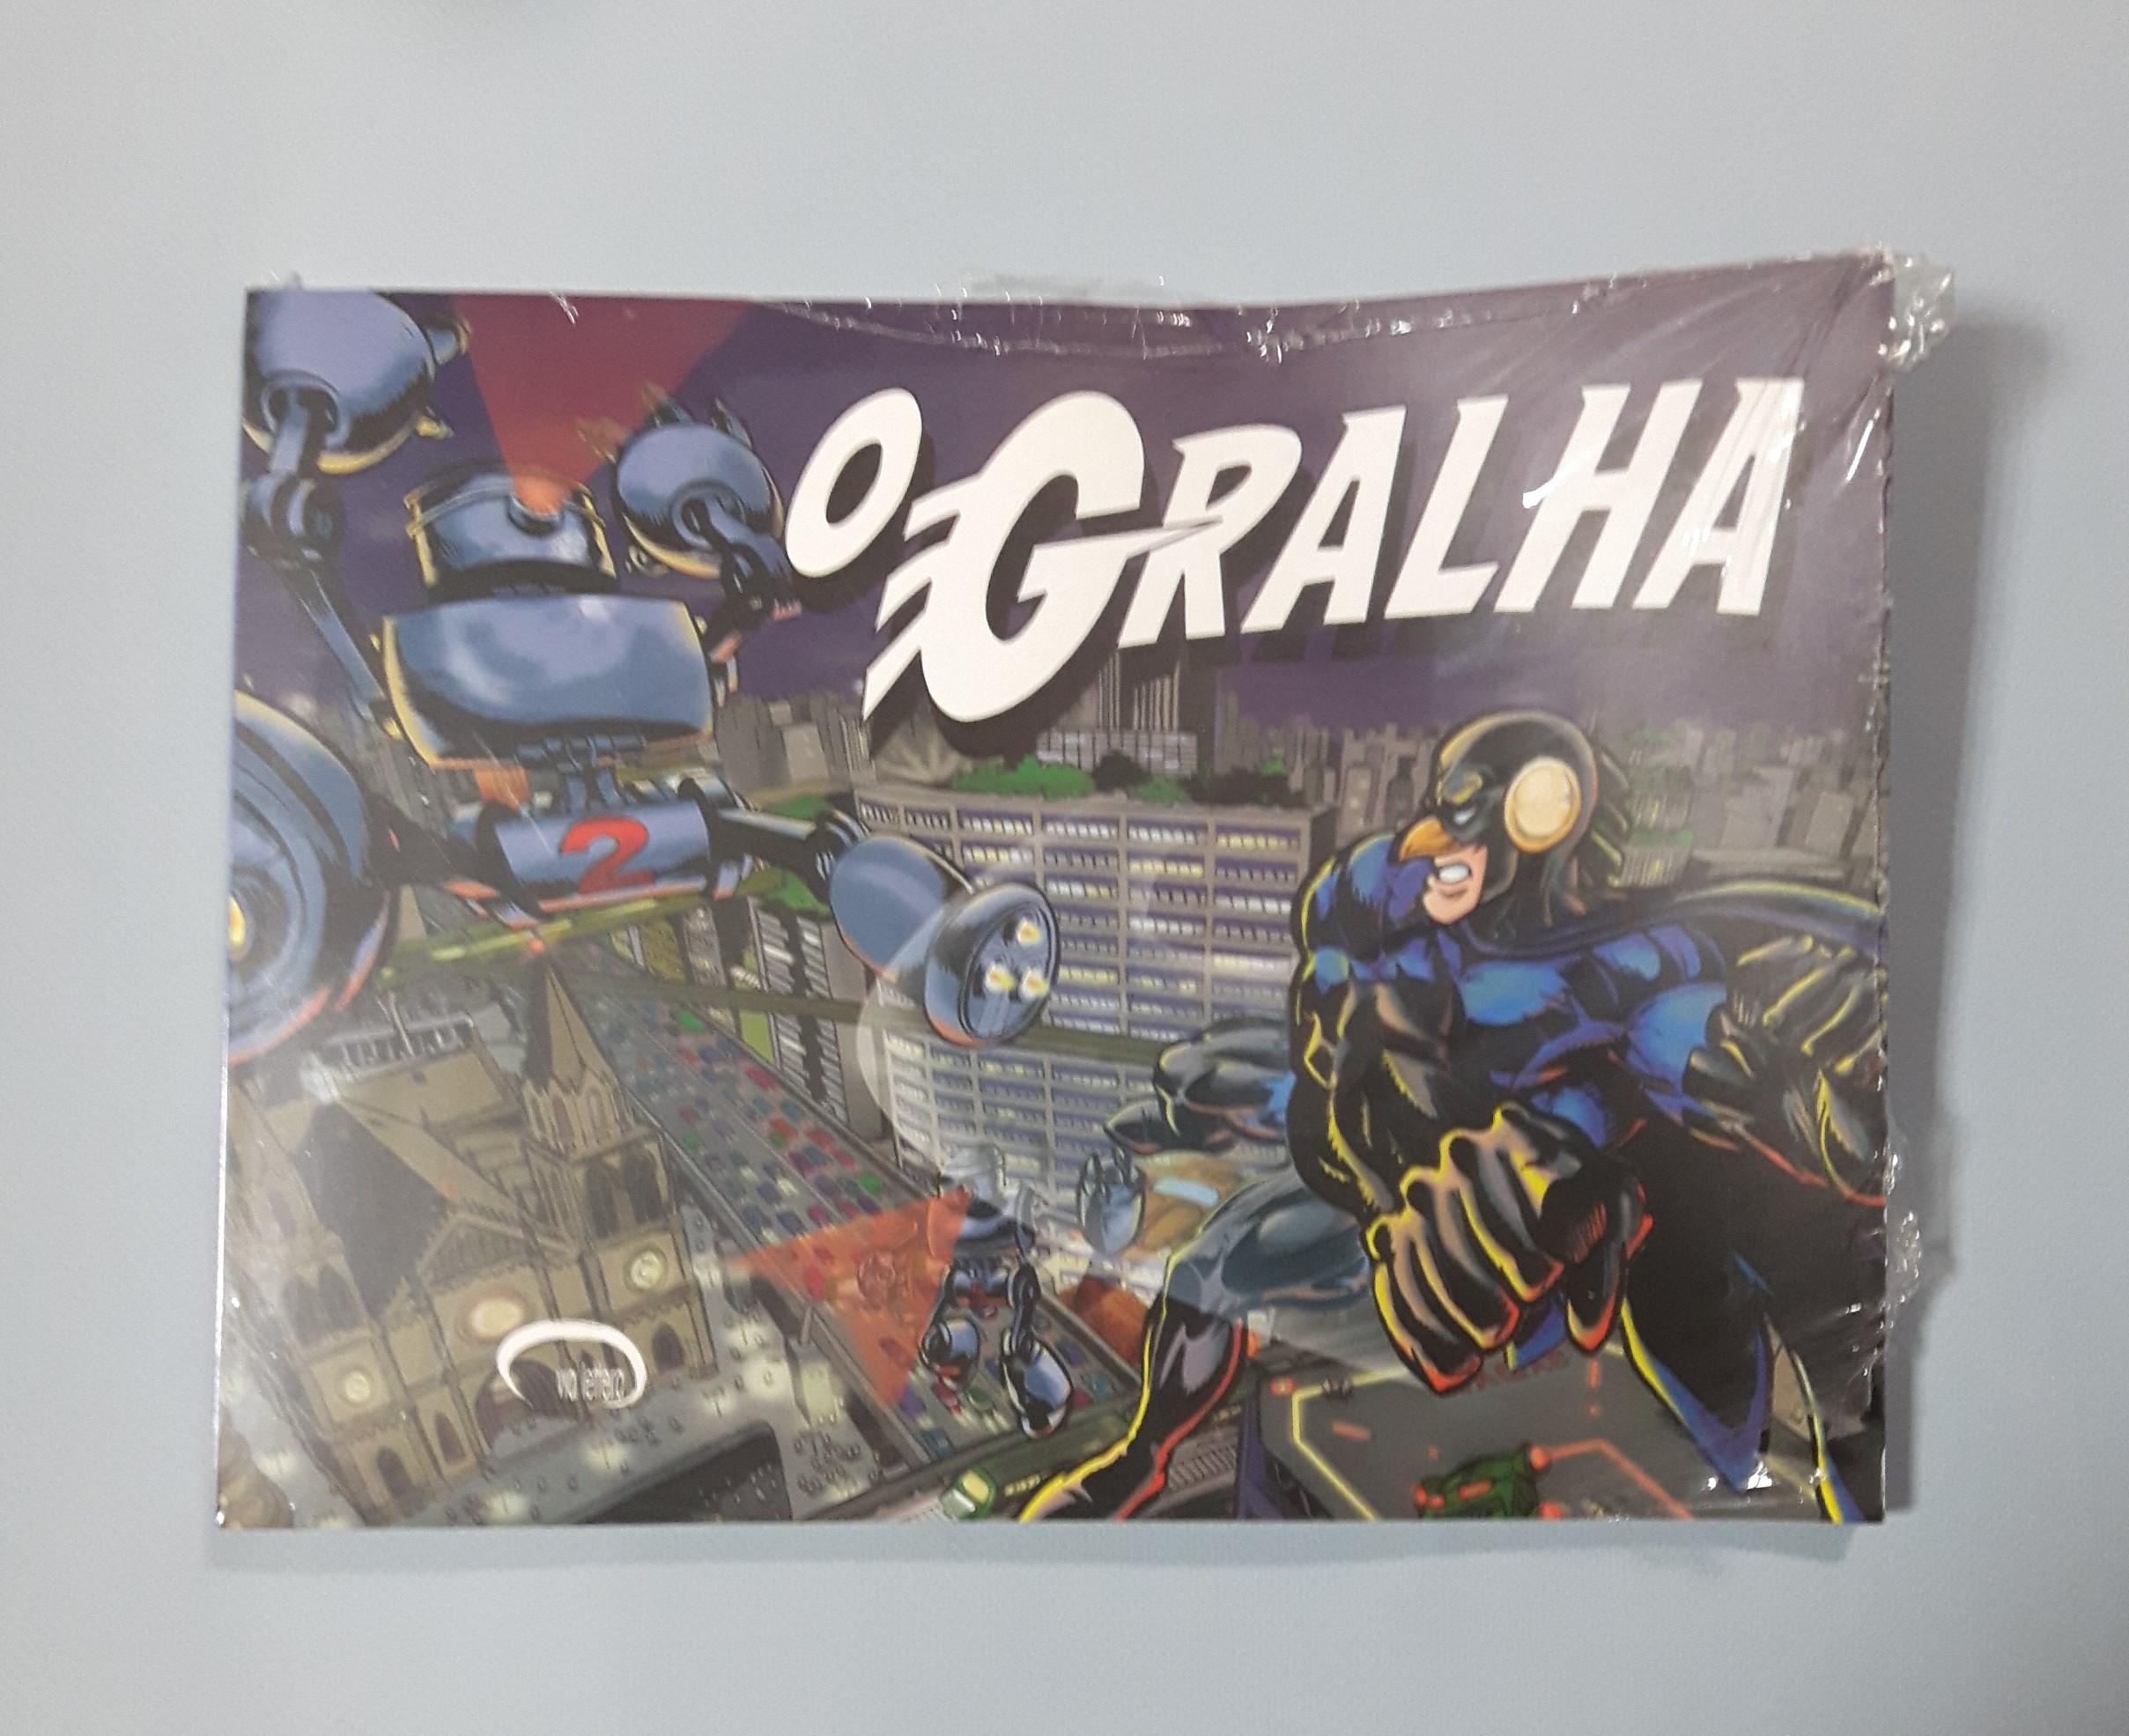 O GRALHA